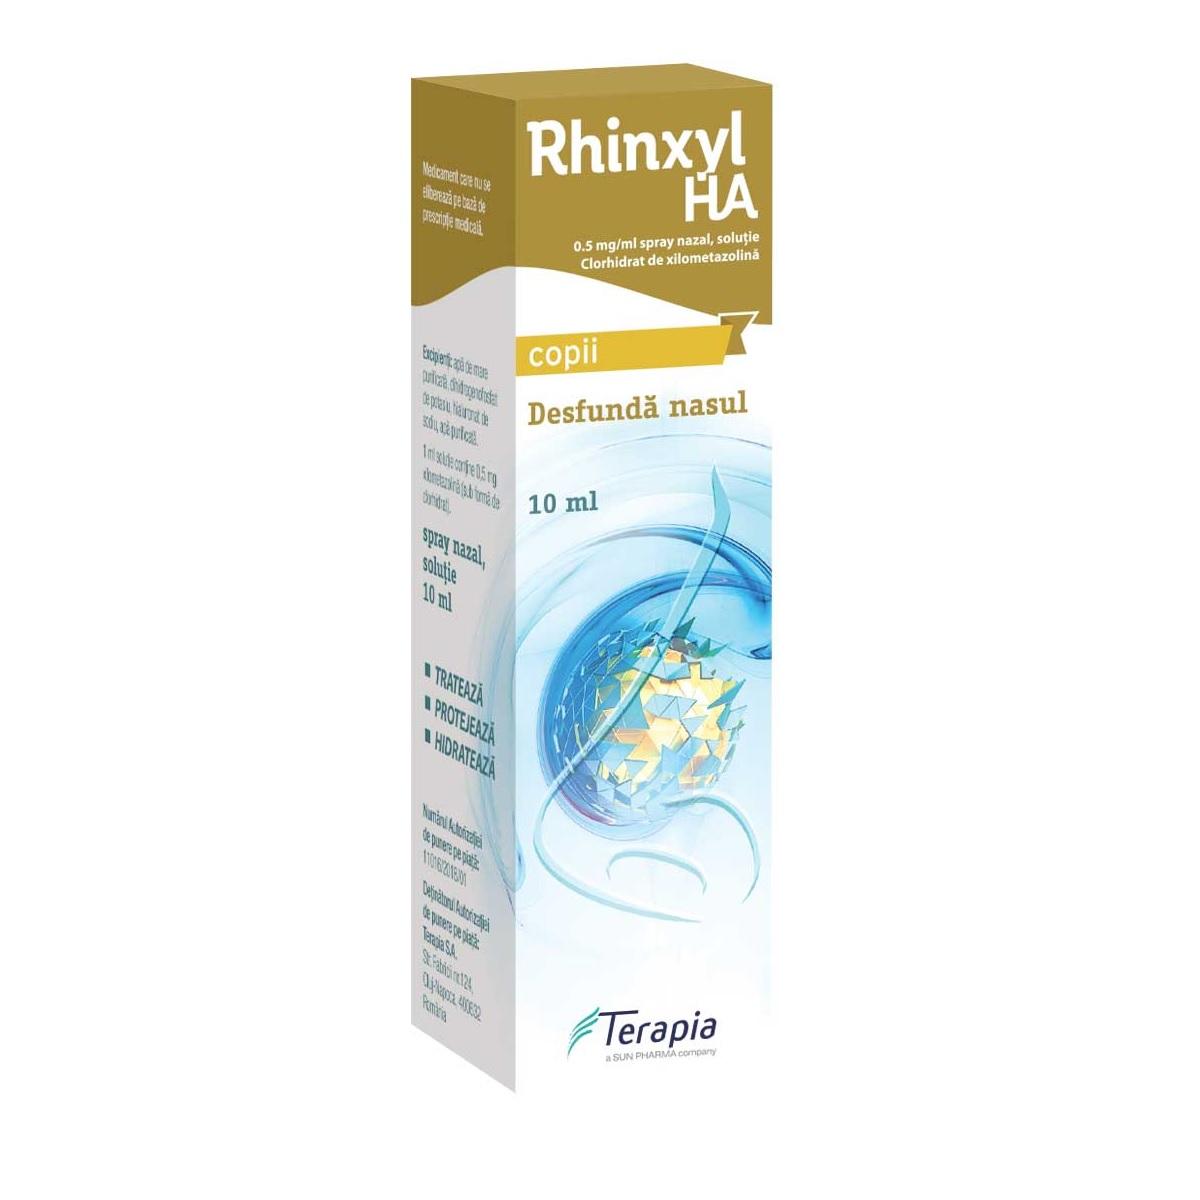 Rhinxyl Ha Copii 0.05% picături, 10ml, Terapia